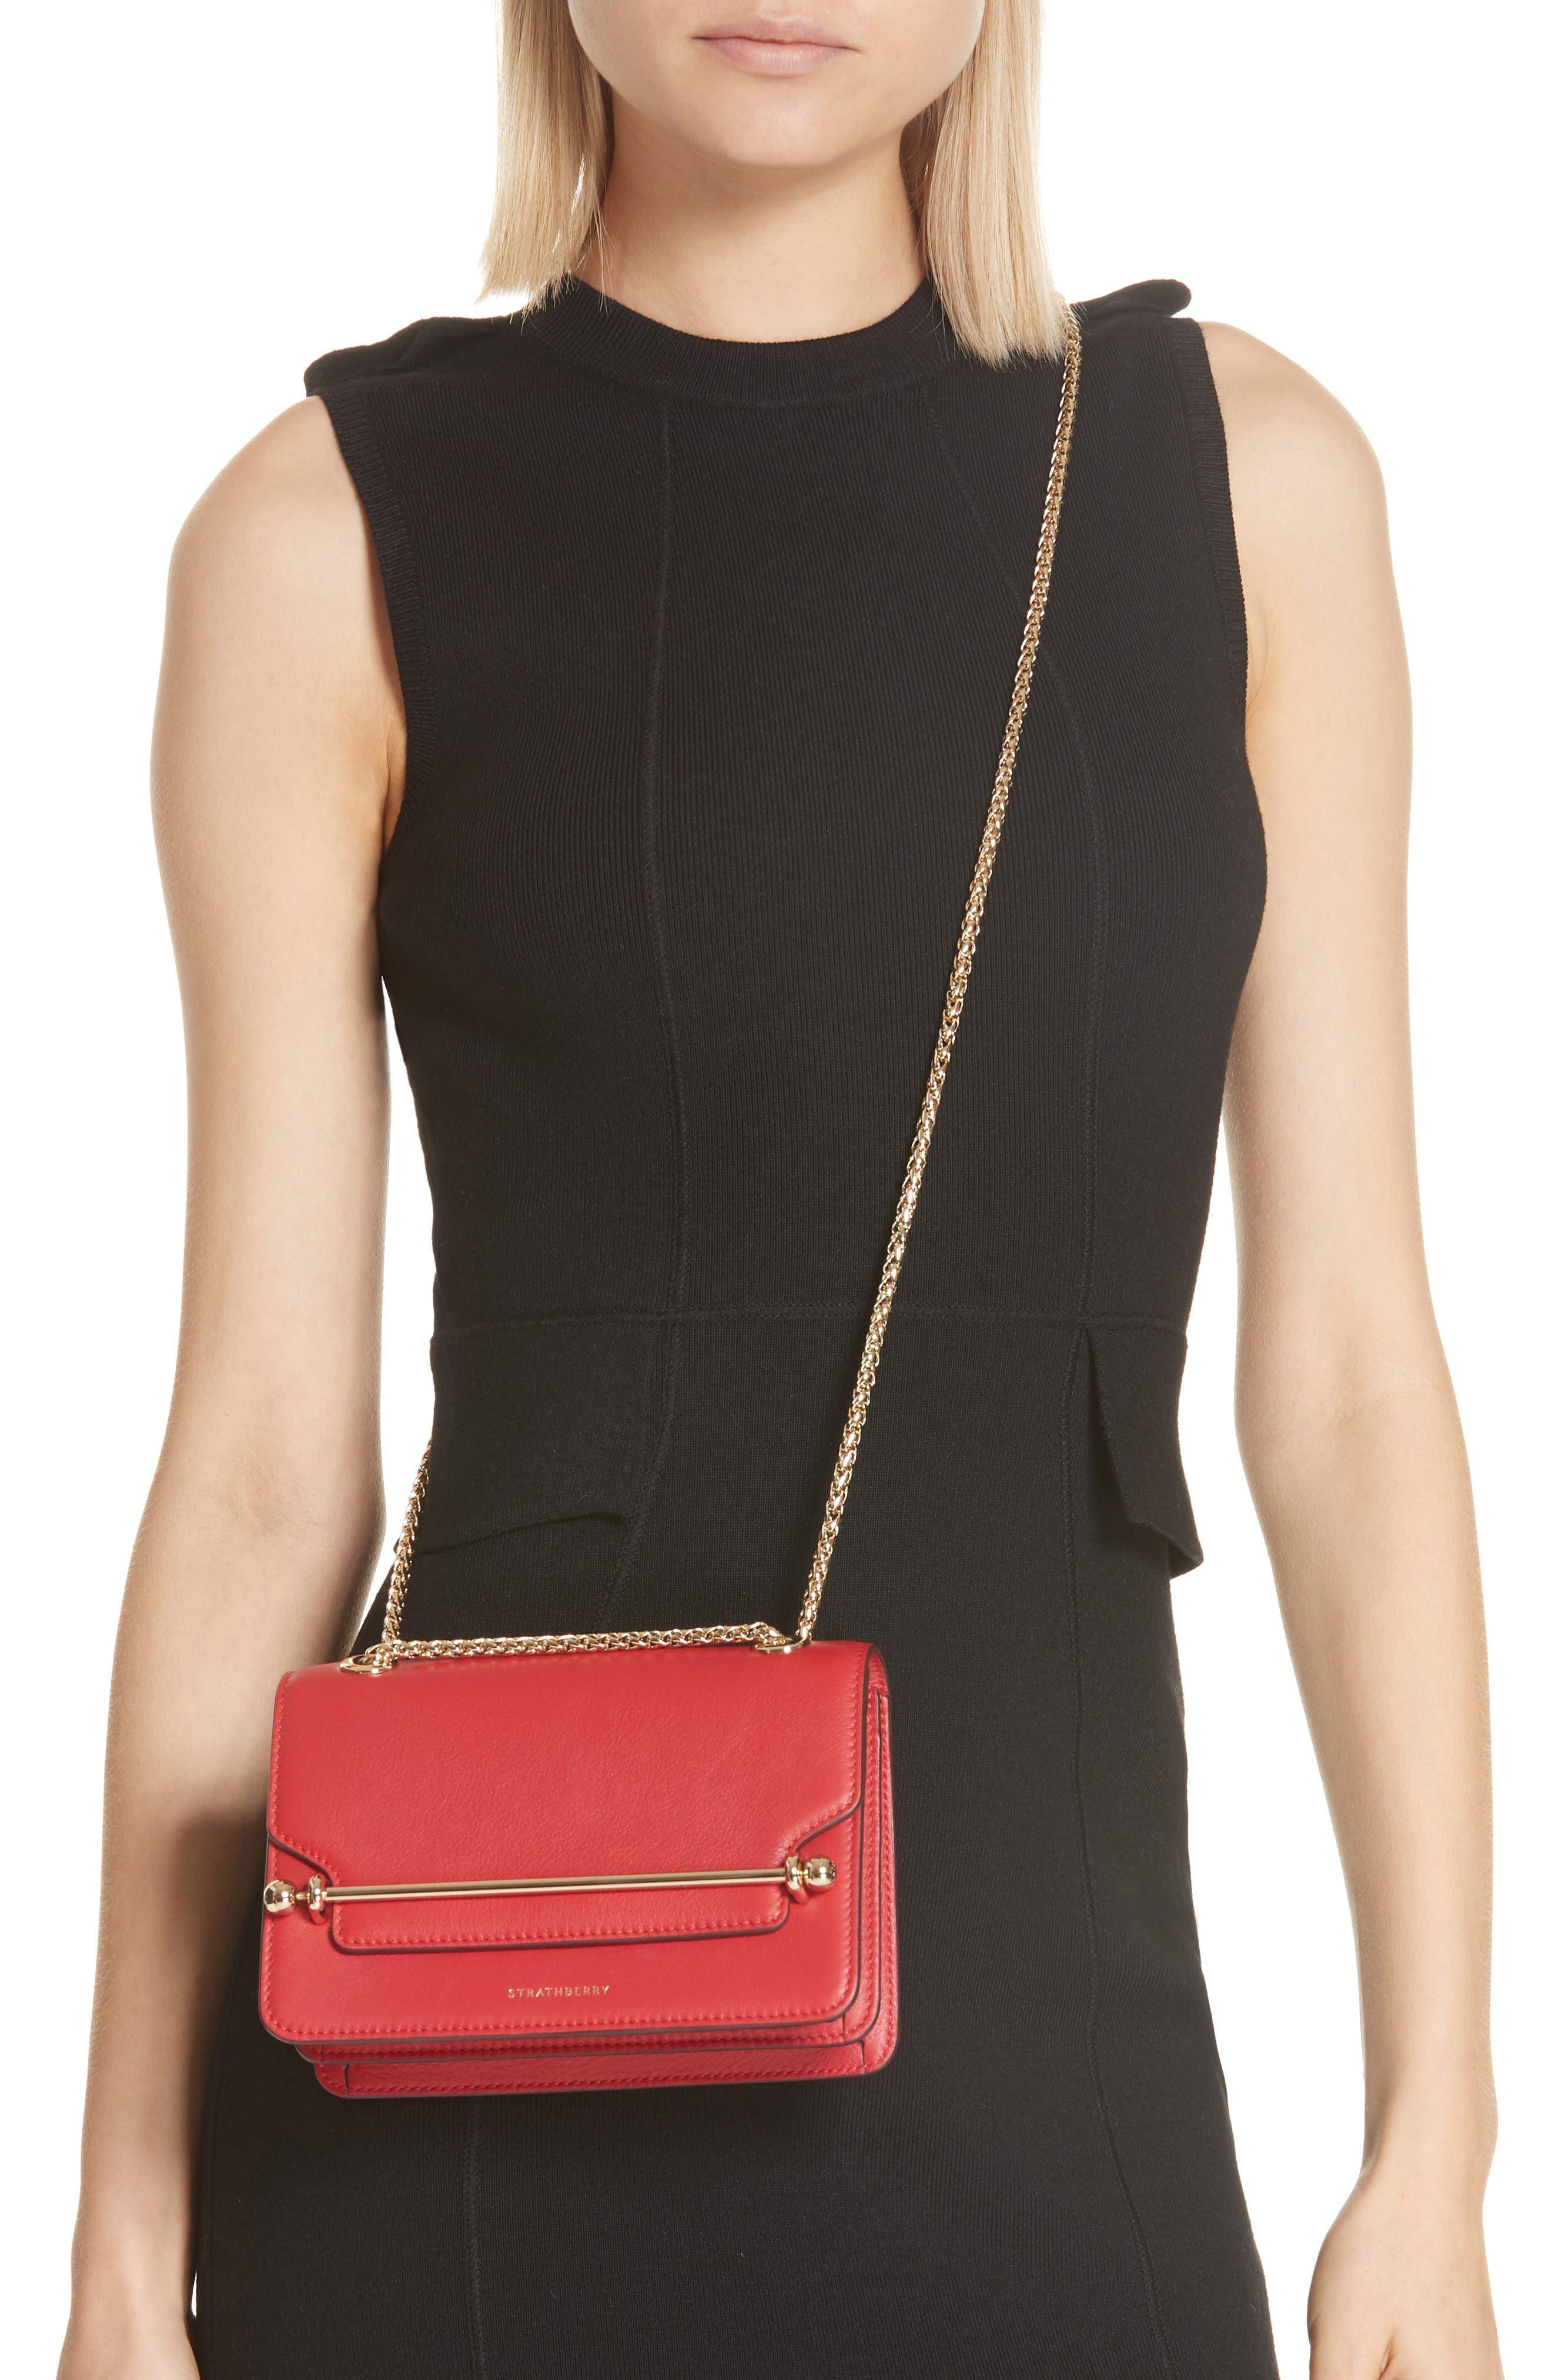 East/West Leather Crossbody Bag,                             Alternate thumbnail 9, color,